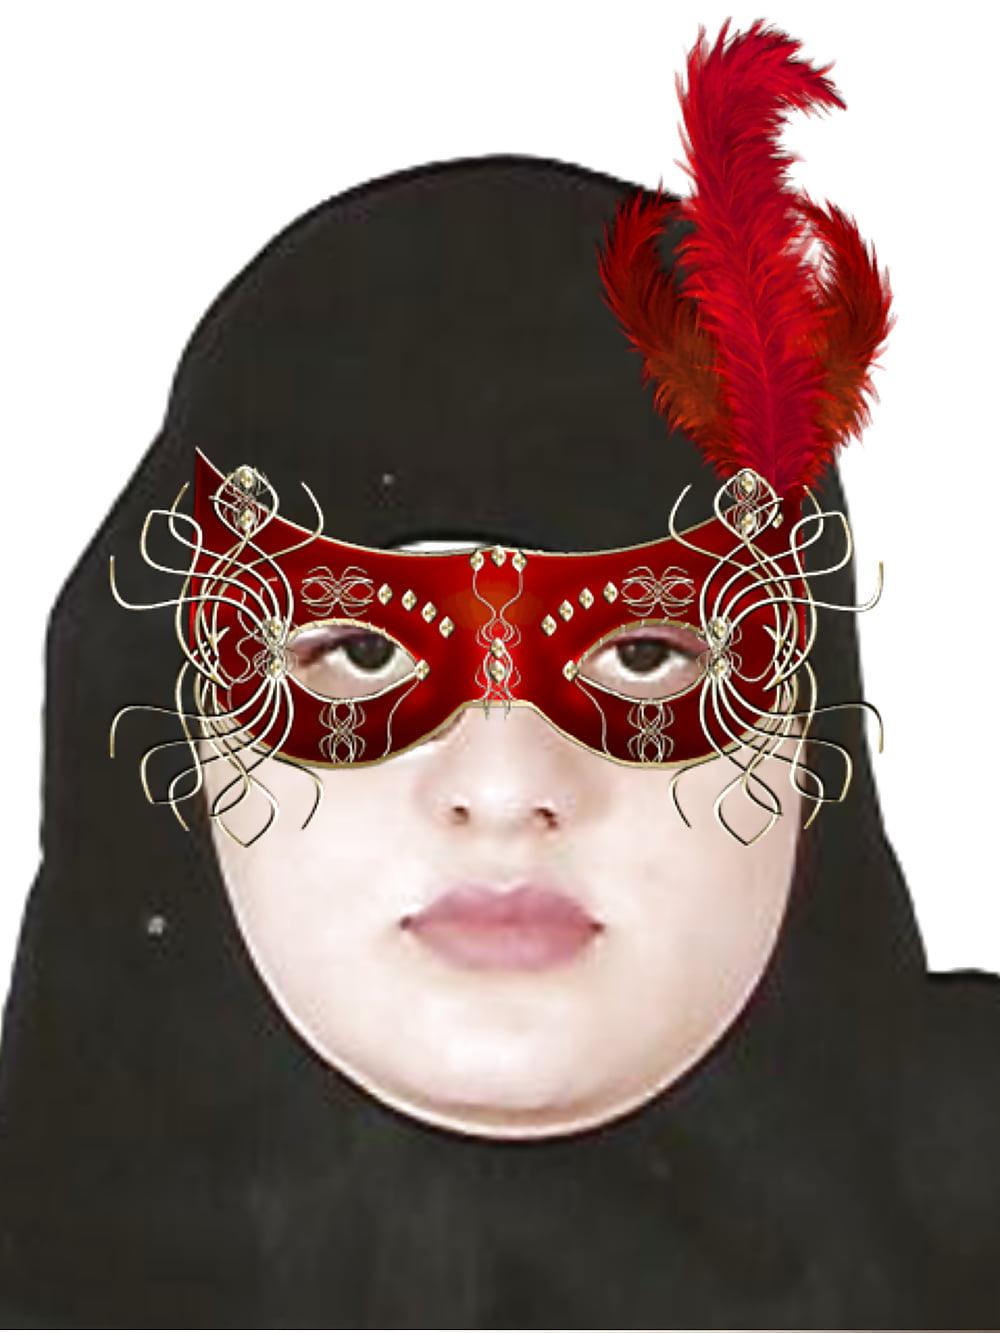 Najah ahmed sheikhi - 4 1